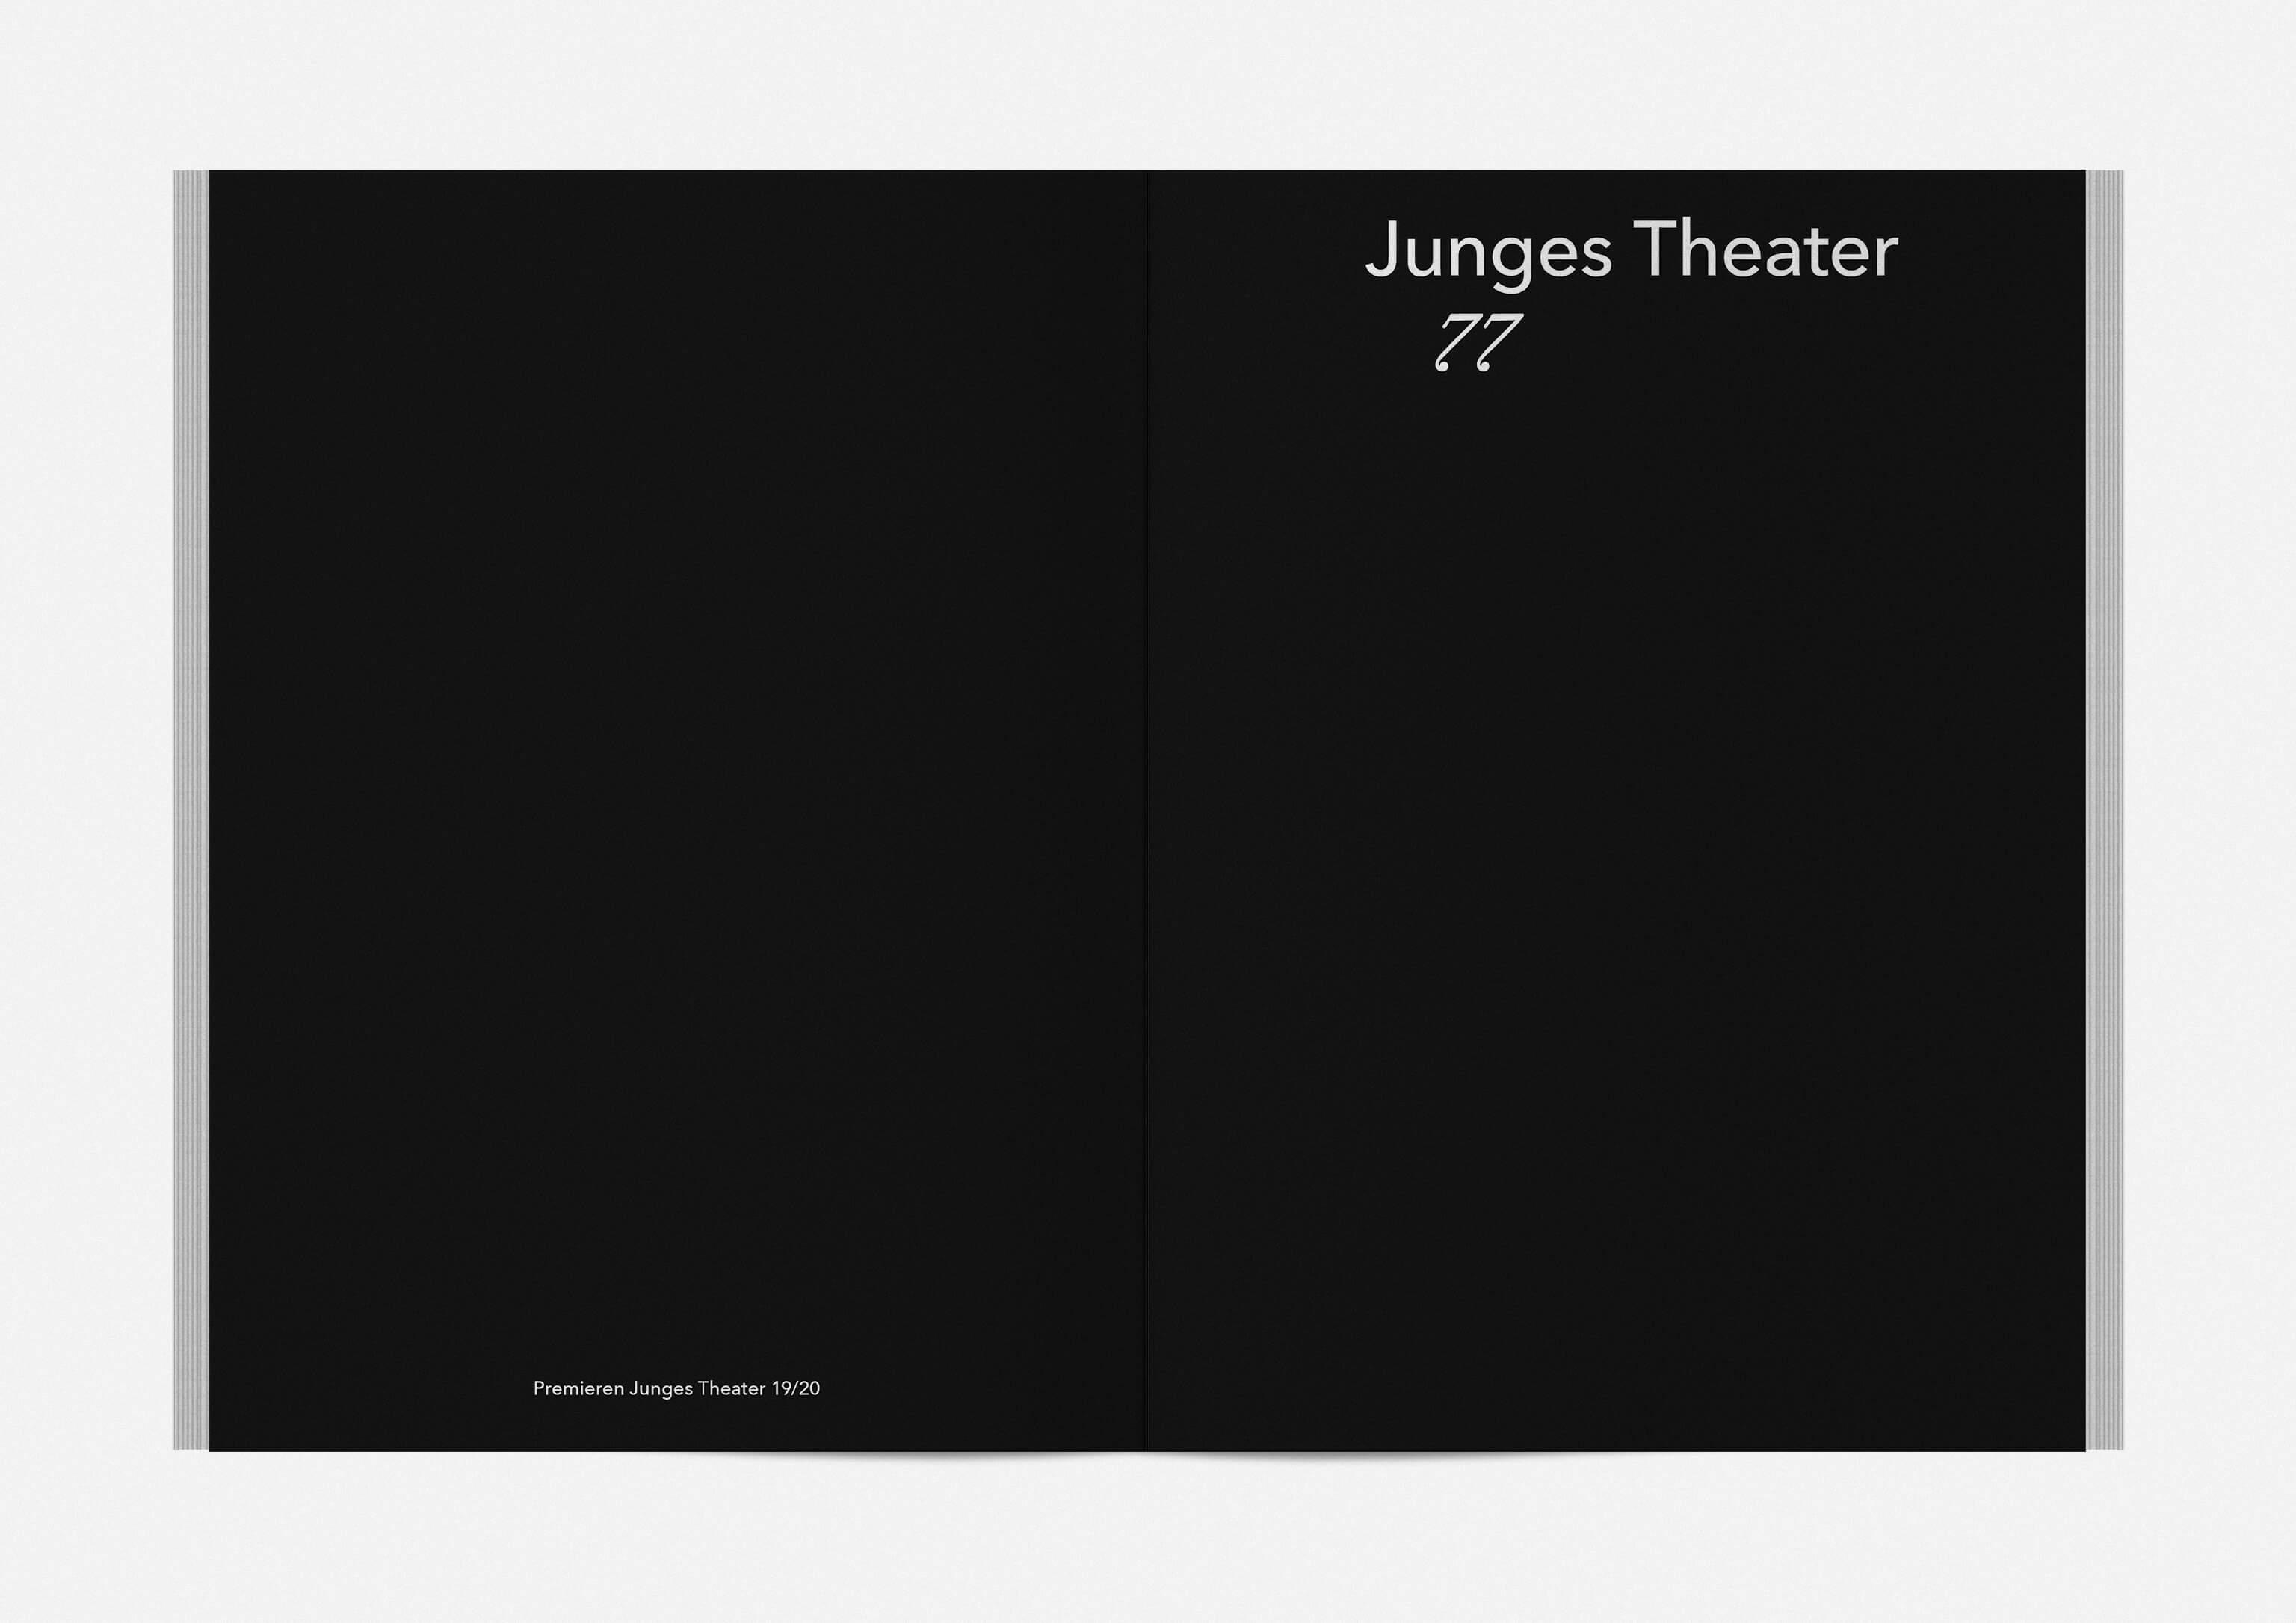 https://neuegestaltung.de/media/pages/clients/theater-erlangen-season-program-19-20/fdd44ad615-1597415332/te_szh_19_20_innenseite_76_77_ng.jpg